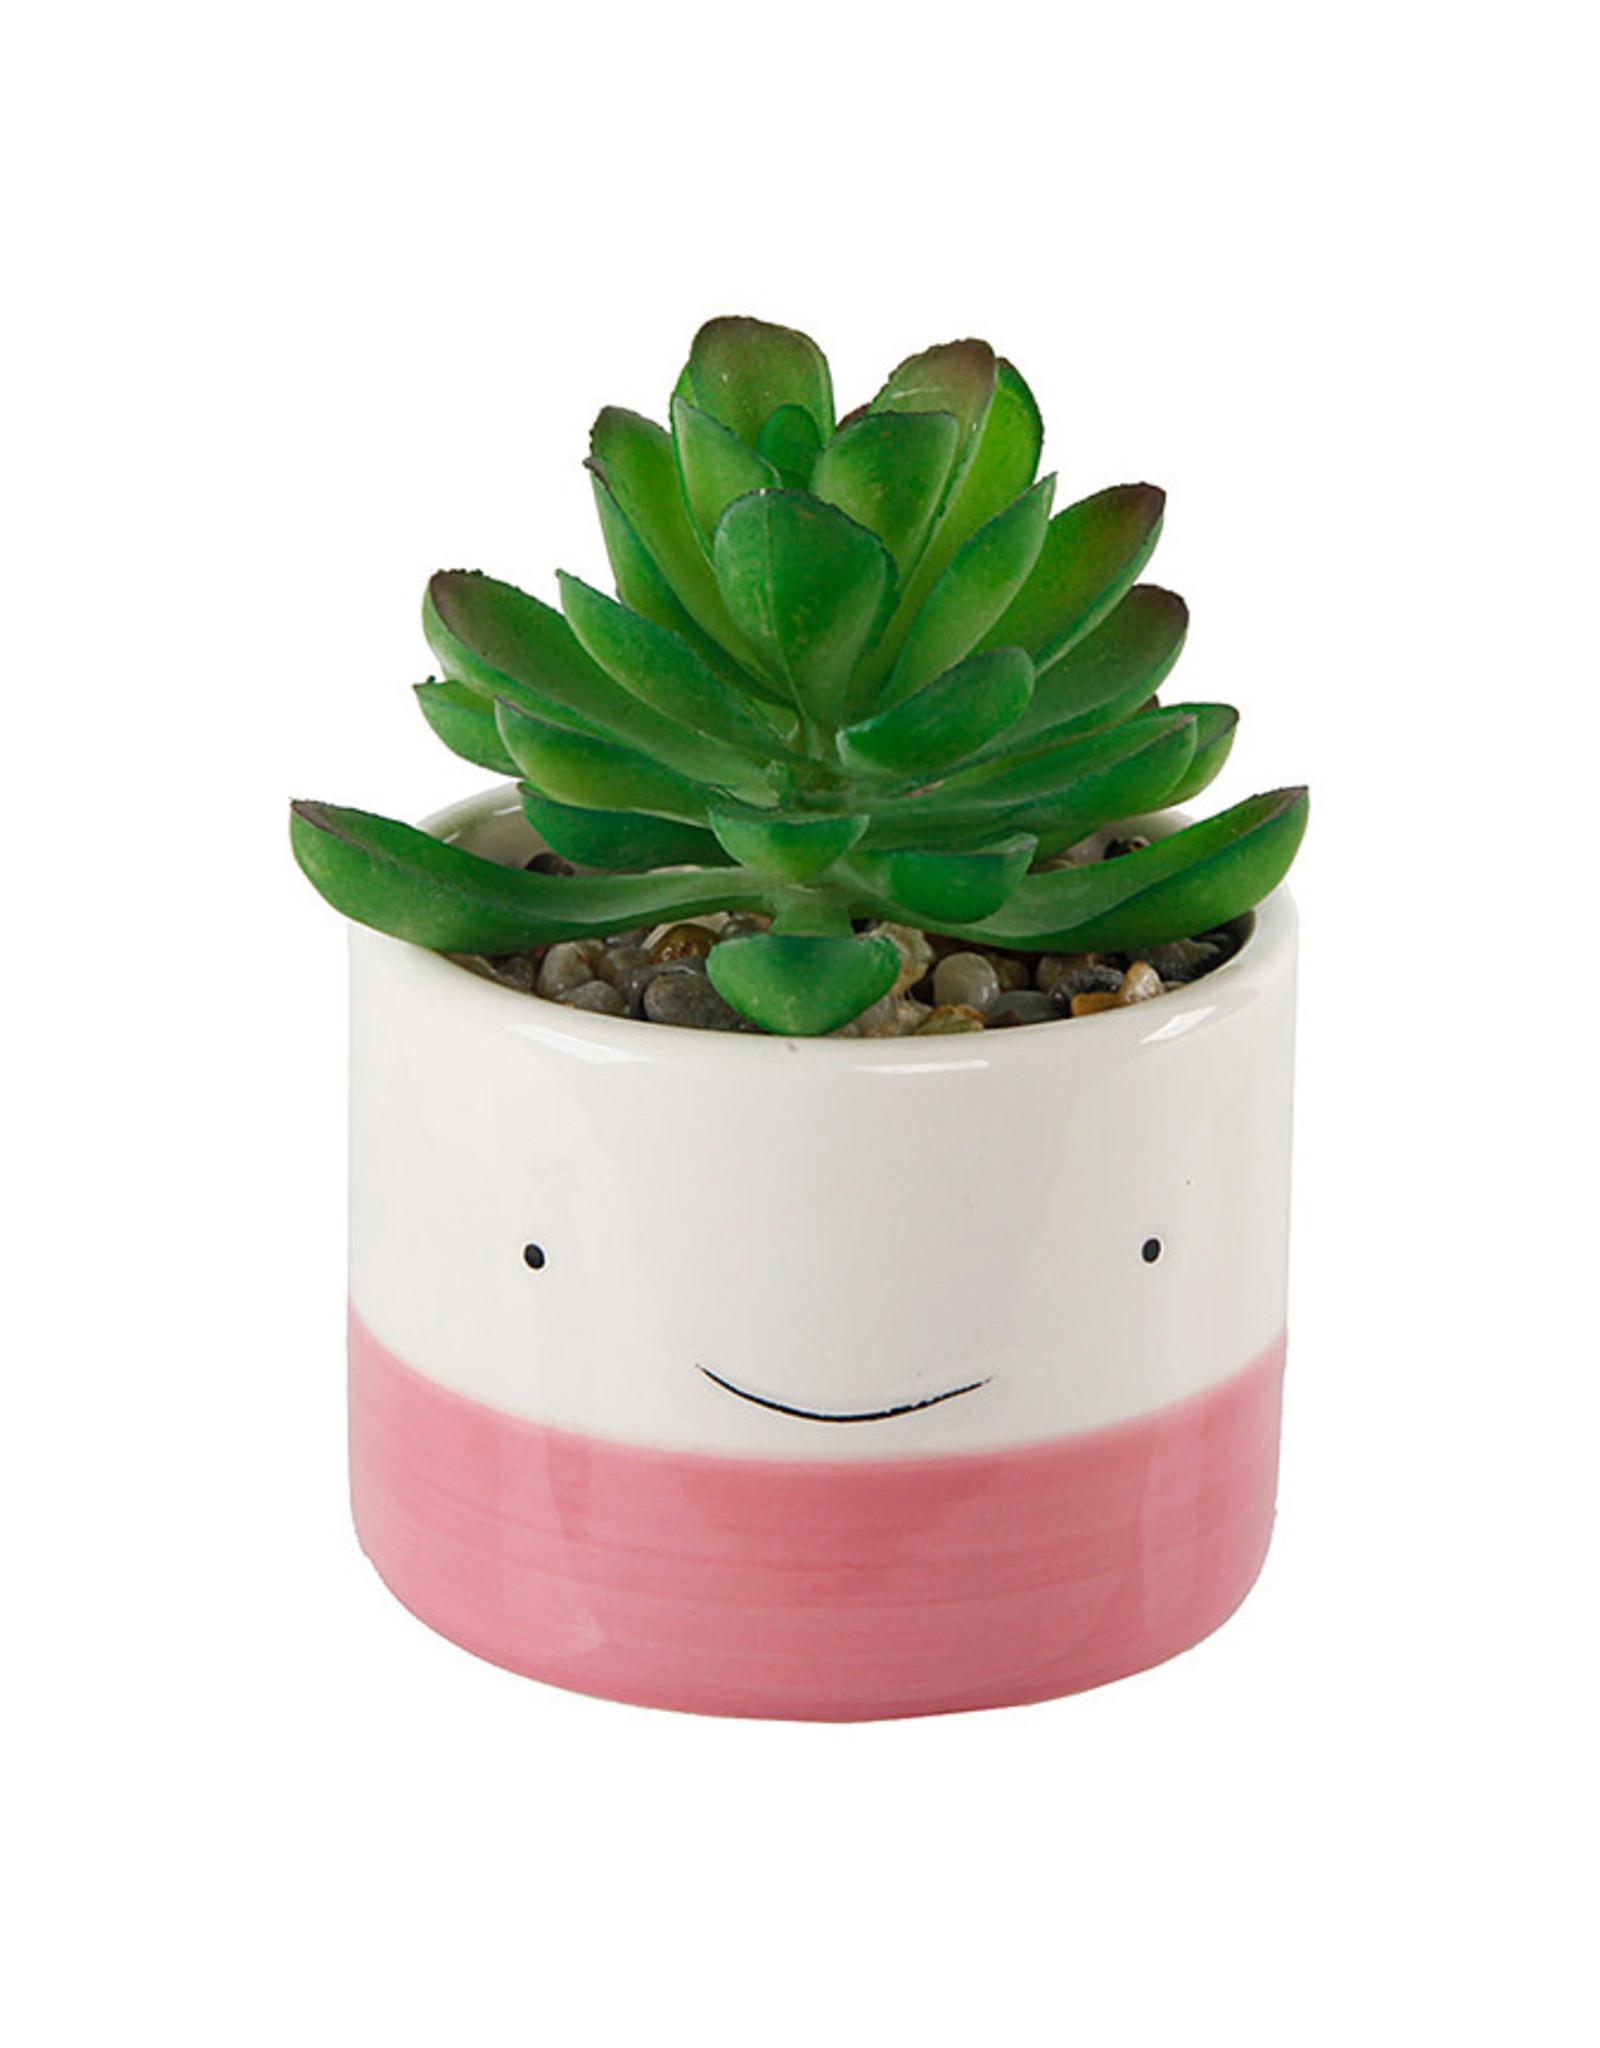 Smiley Face Succulent Planter - Pink